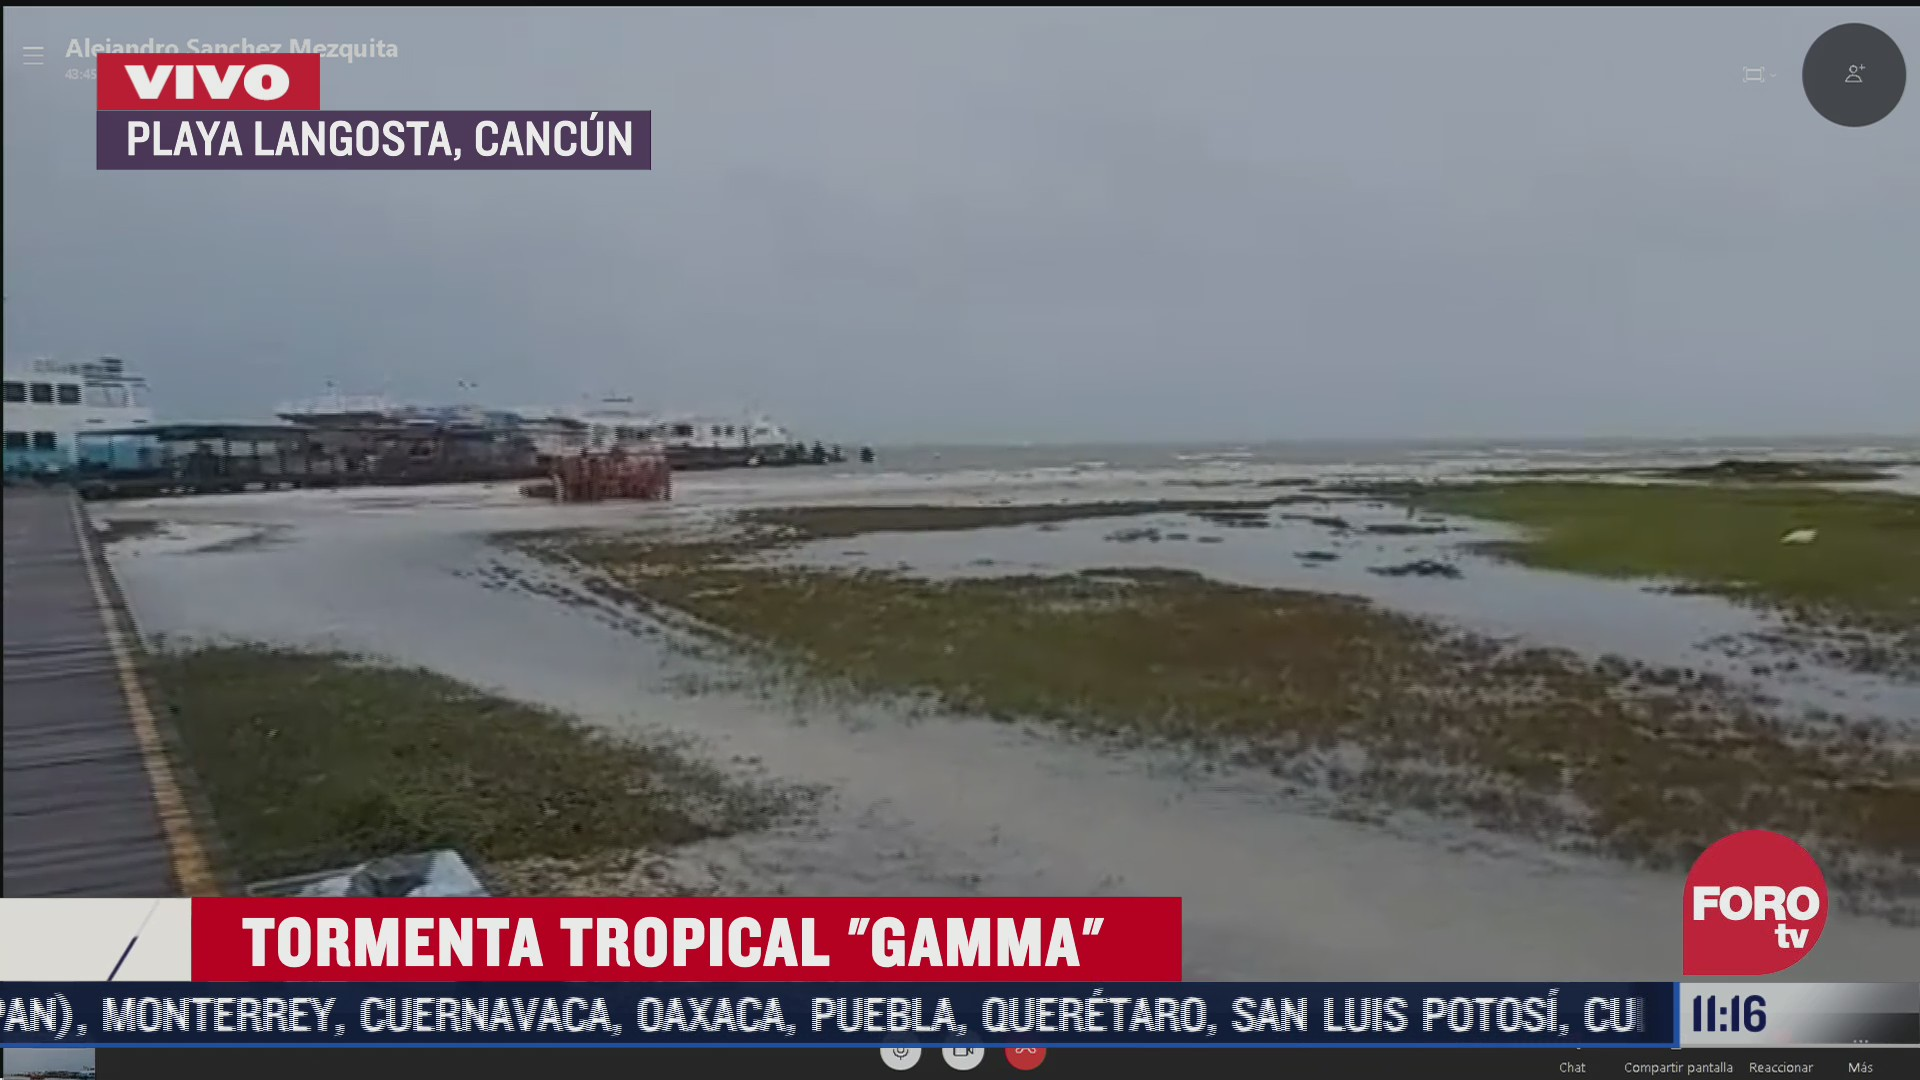 tormenta tropical gamma impactara en las proximas horas tulum quintana roo